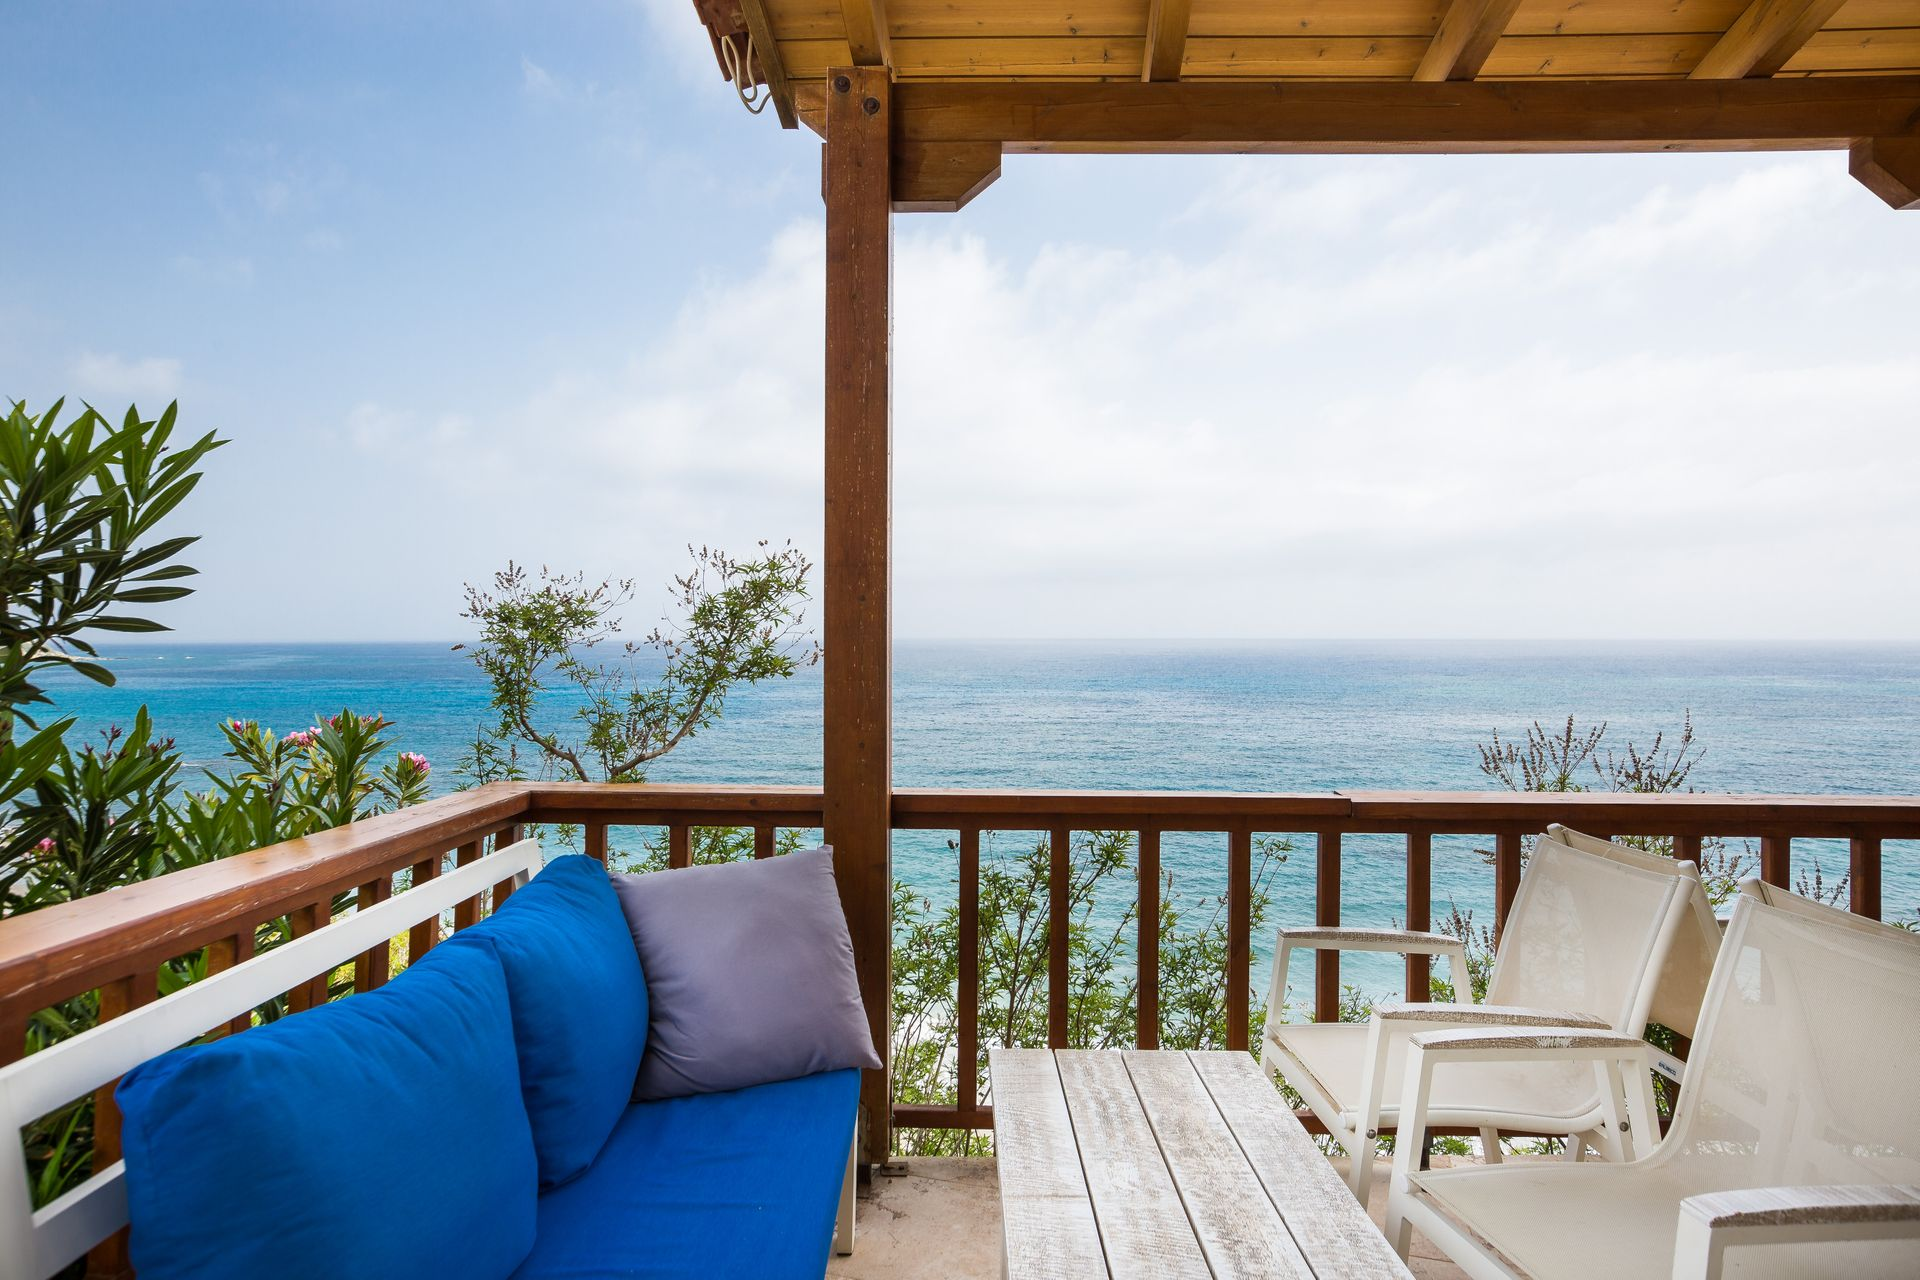 Fata Morgana - Σφακιά, Κρήτη ✦ -2% ✦ 11 Ημέρες (10